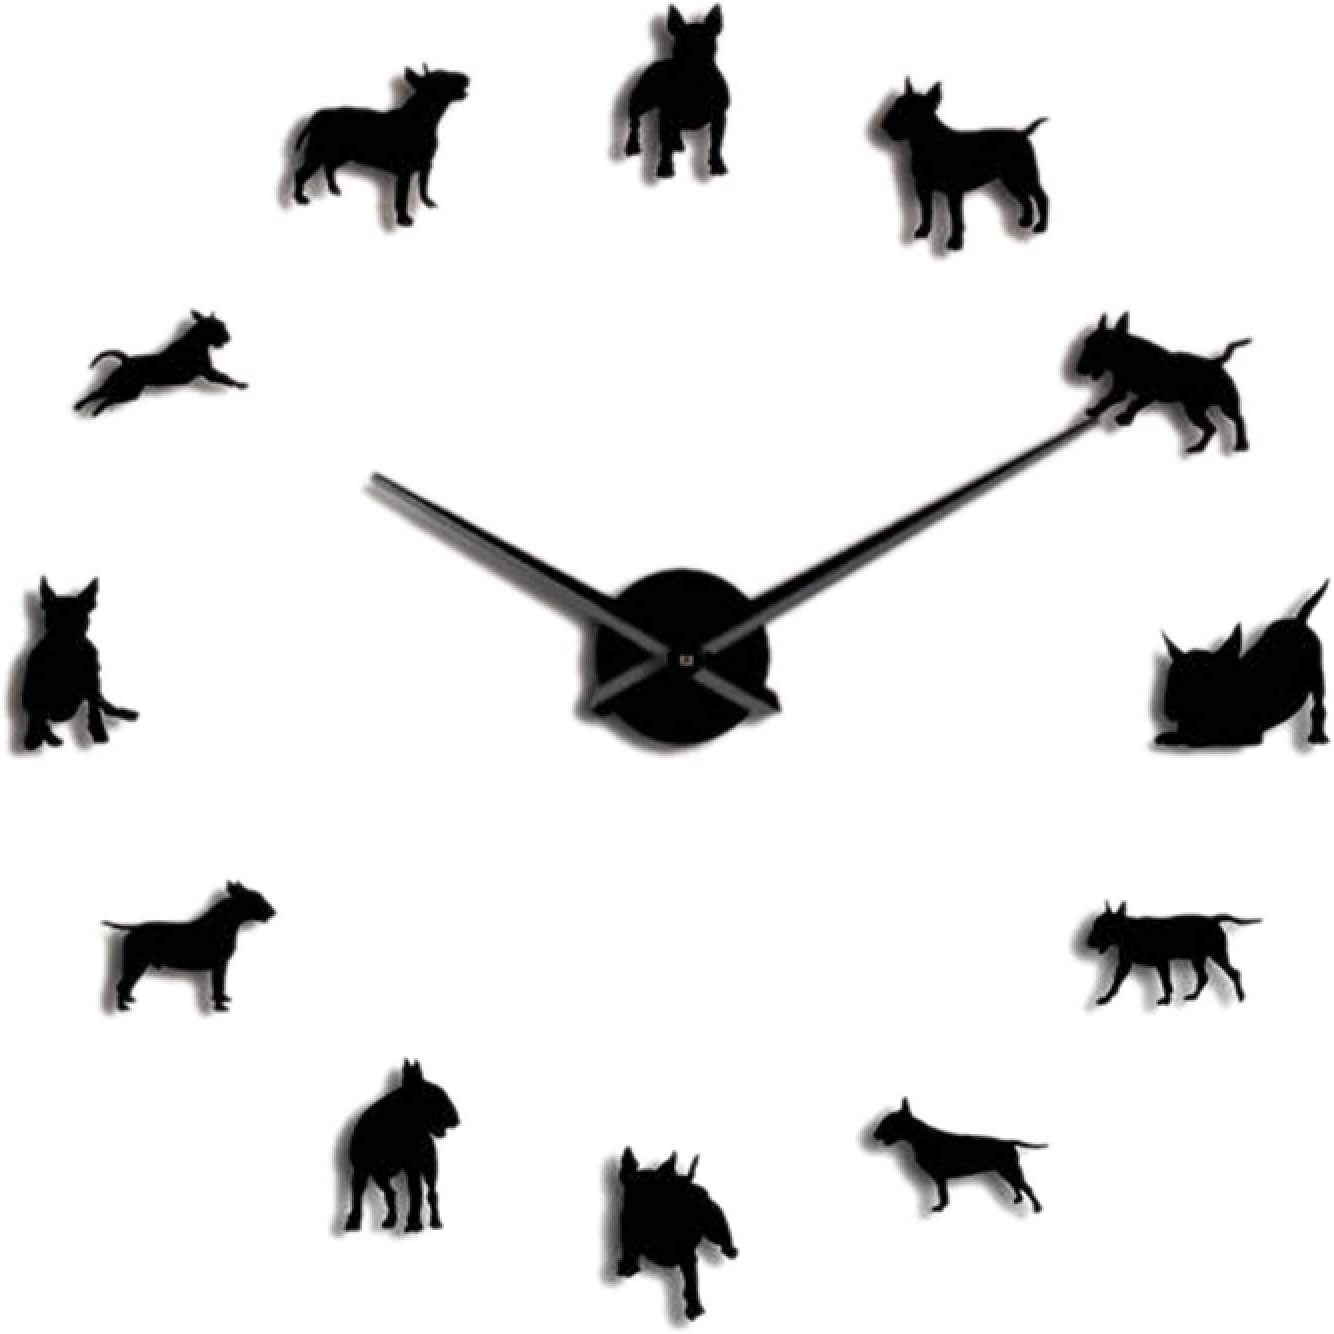 Wall Clock Bull Terrier Dog Wall Art DIY Large Wall Clock Dog Breed Pug Big Needle Clock Watch Pet Shop Decor for Bull Terrier Lovers Wall Watch Quartz Silent Non Ticking Big Digital Gift Wall Clock